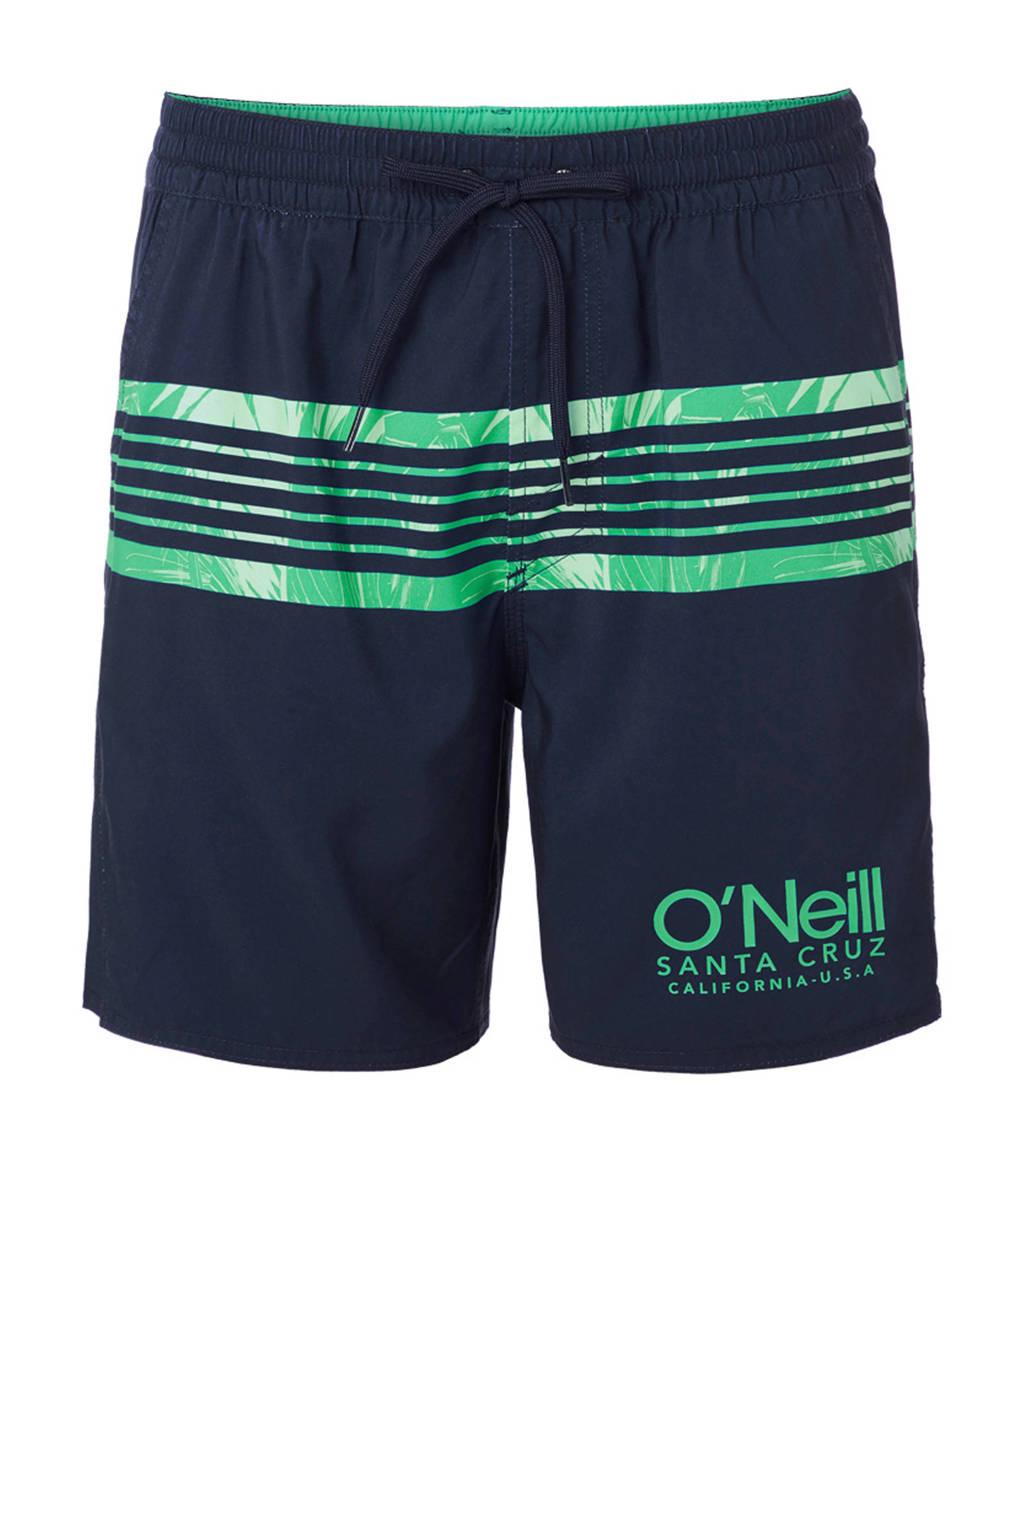 O'Neill zwemshort Cali donkerblauw/groen, Donkerblauw/groen